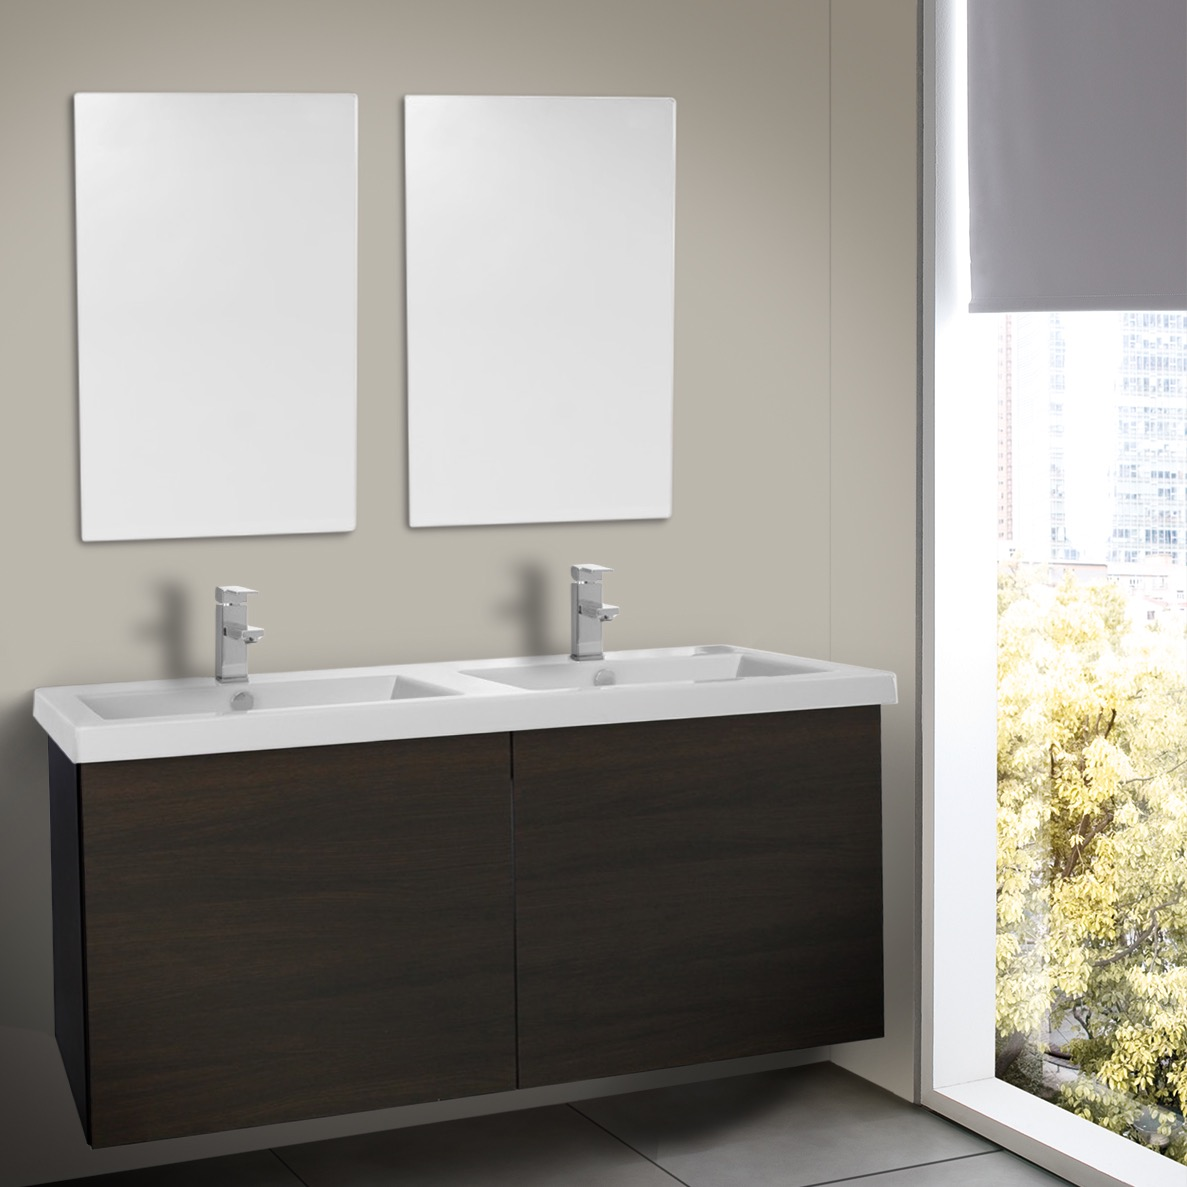 47 Inch Wenge Double Bathroom Vanity with Ceramic Sink, Mirrors ...